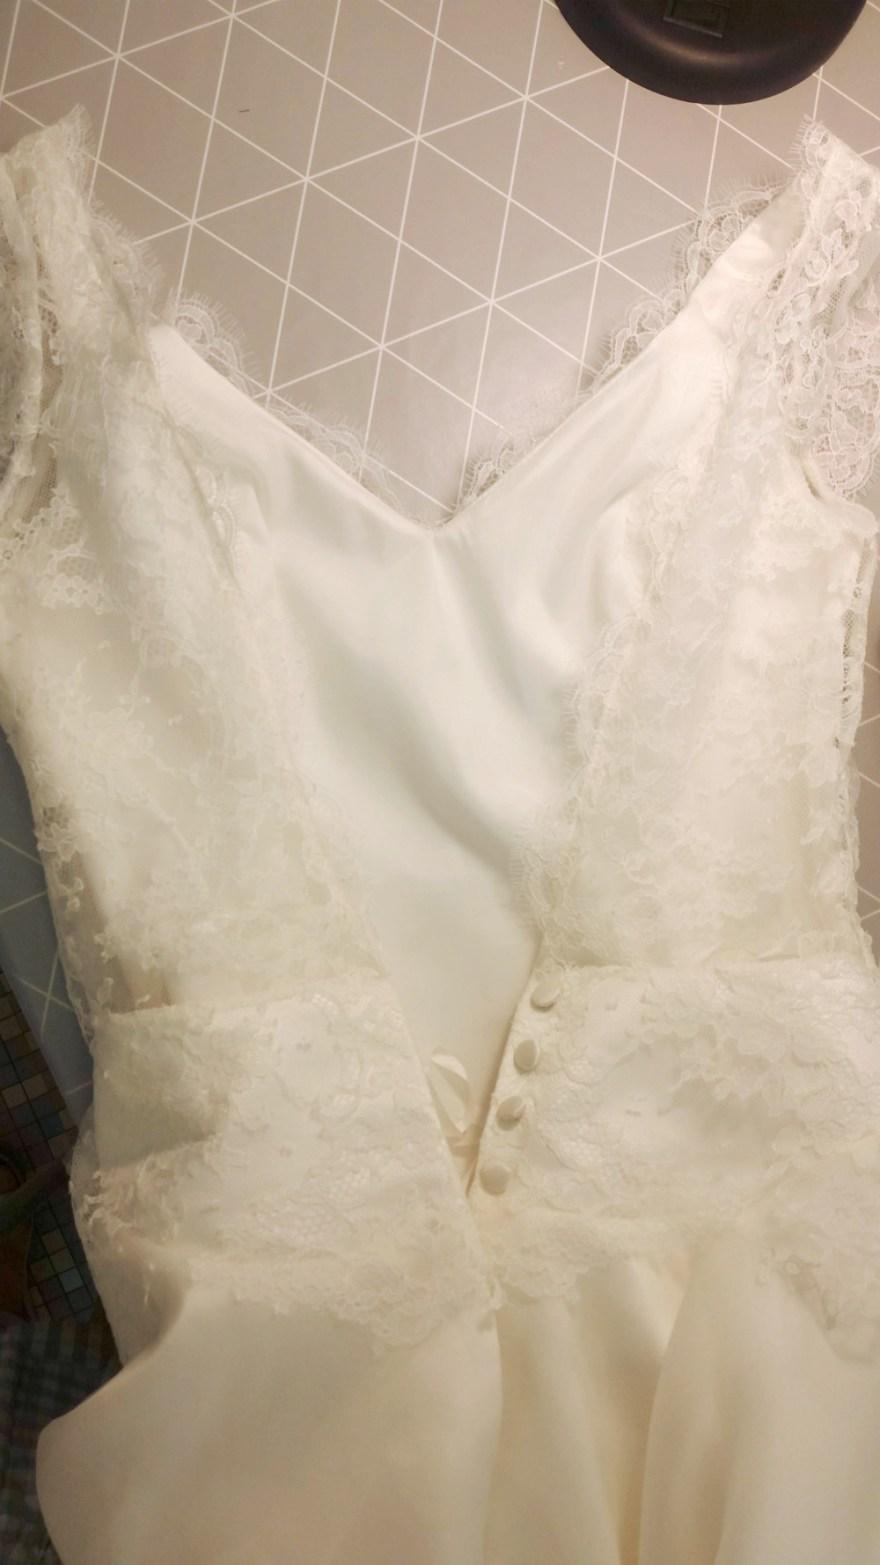 création de robe de mariée sur mesure 78 92